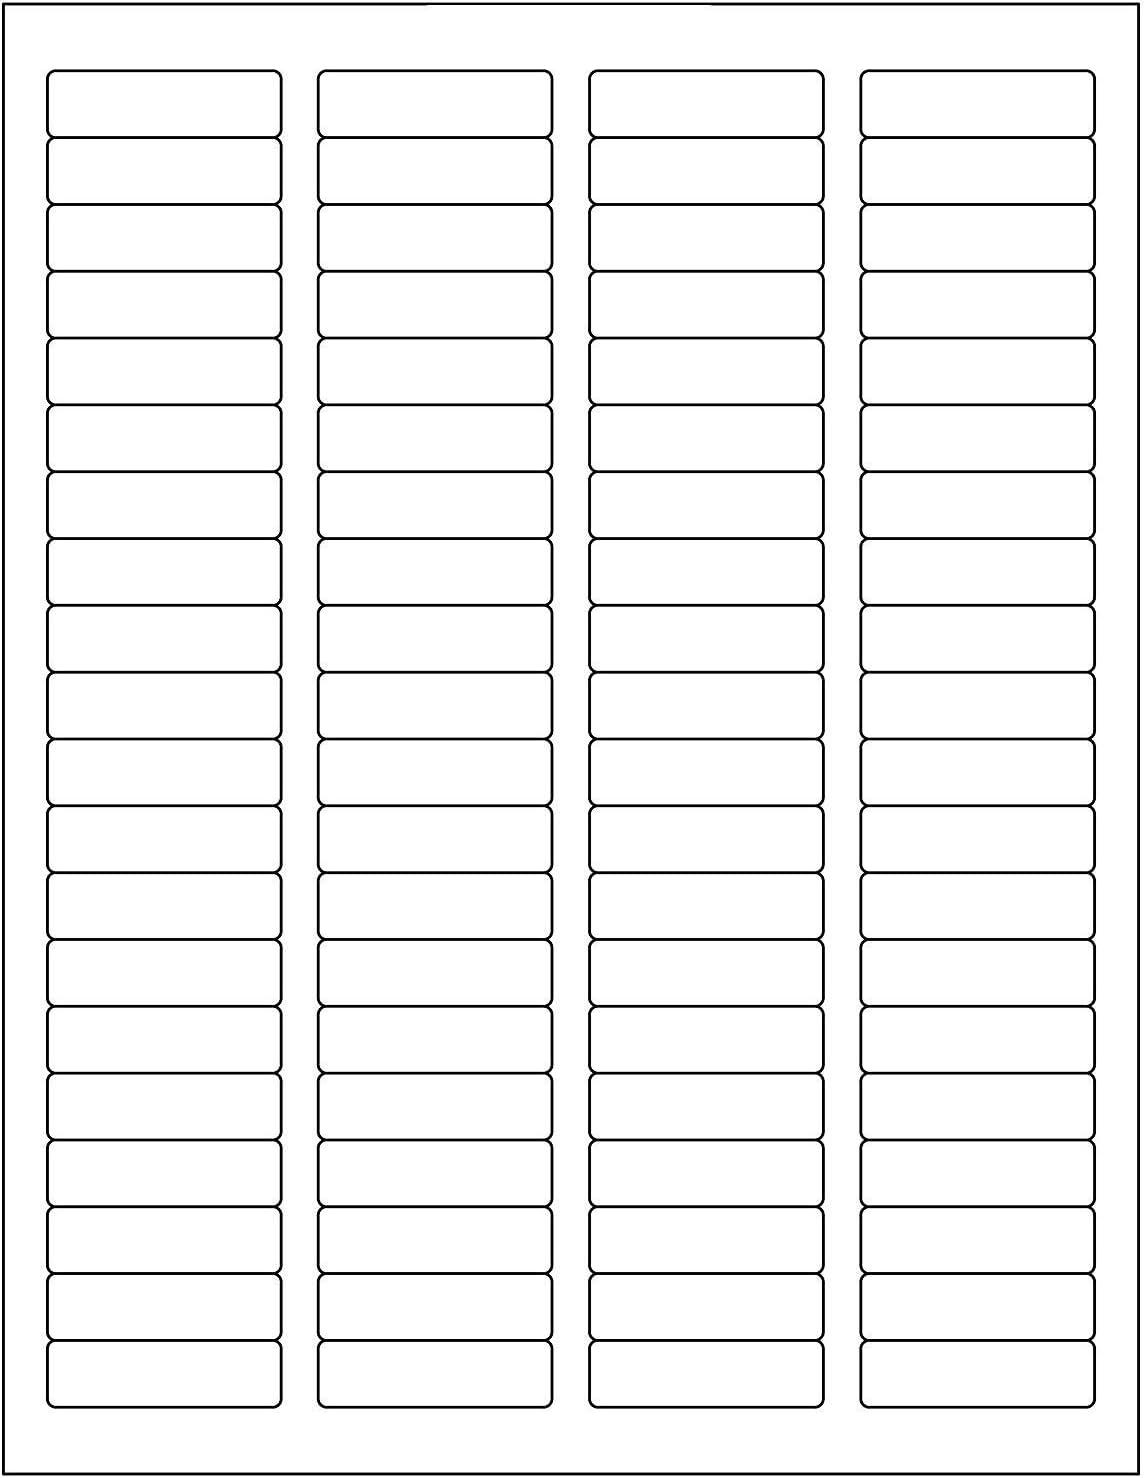 "BESTeck White Laser Inkjet 1.75""x0.5"" Return Address Mailing FBA Labels 80-UP 80 Labels Per Sheet (100 Sheets) : Office Products"